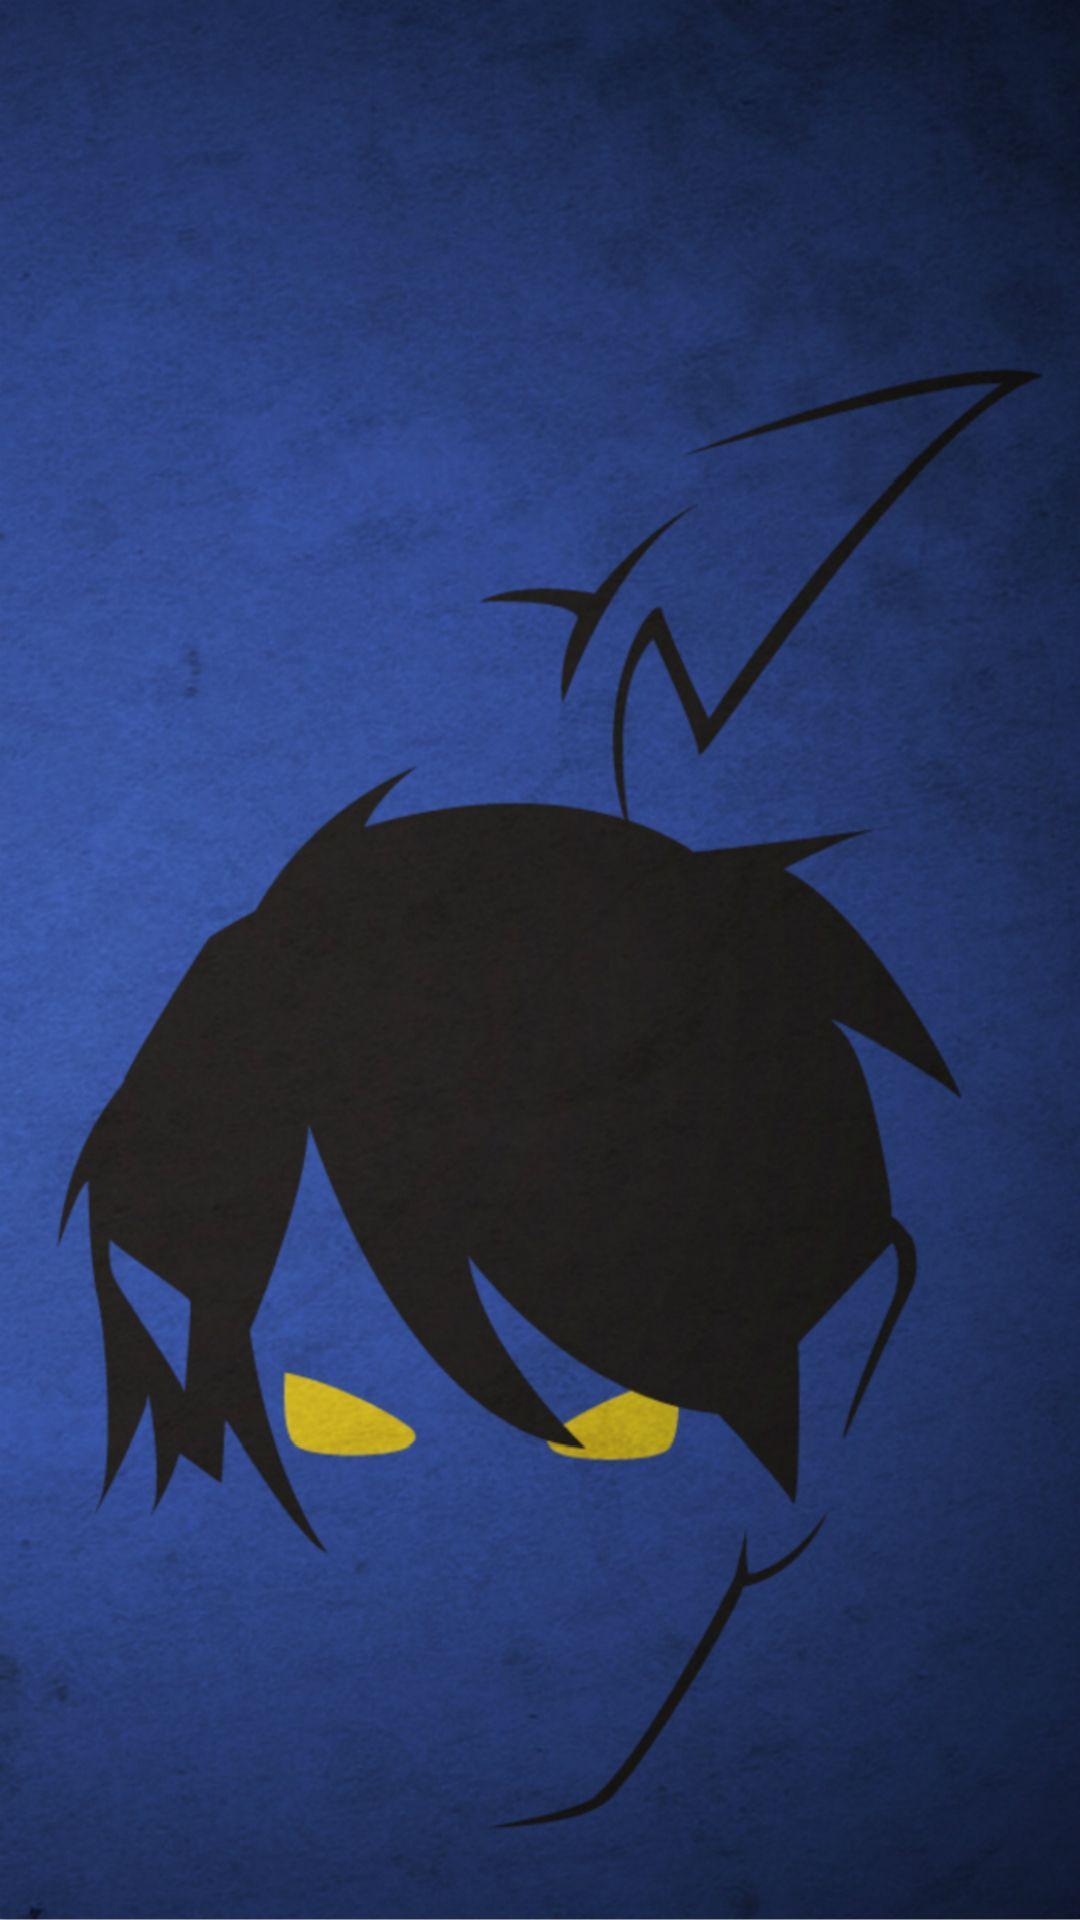 Dark Cartoon Iphone Wallpapers Top Free Dark Cartoon Iphone